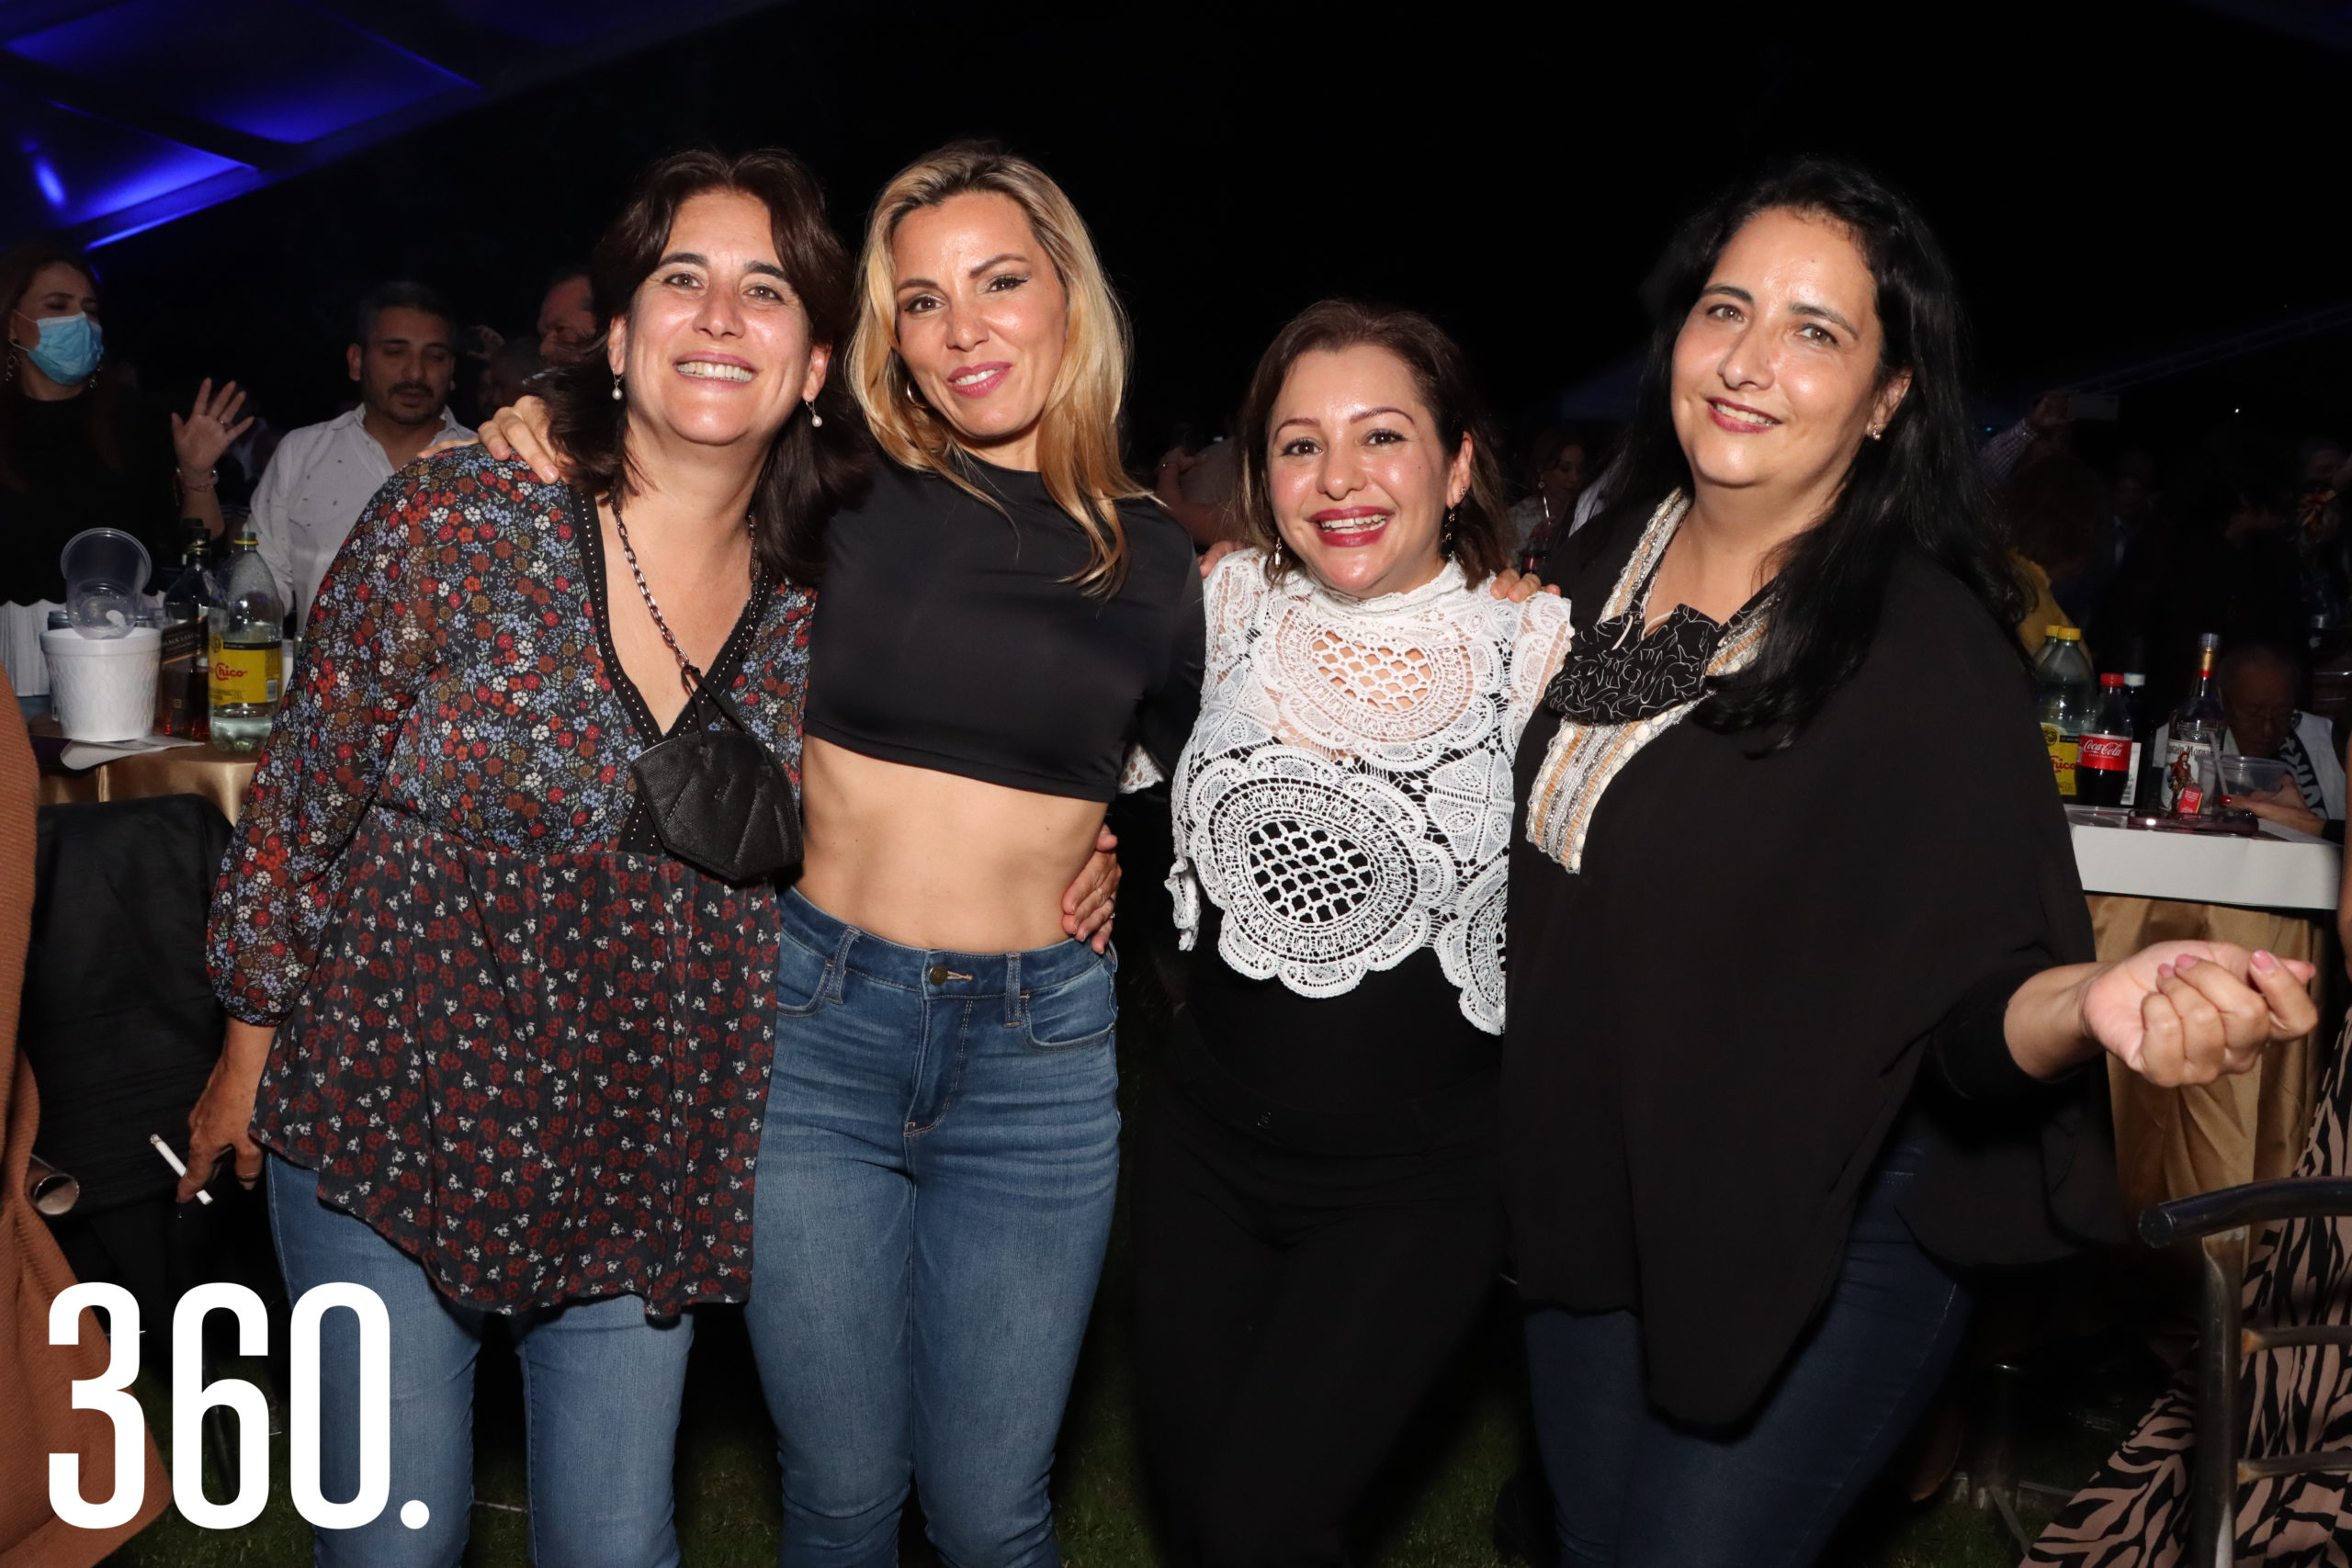 Rebeca Cárdenas, Melissa Cavazos, Verónica Rivera e Irma Cárdenas.